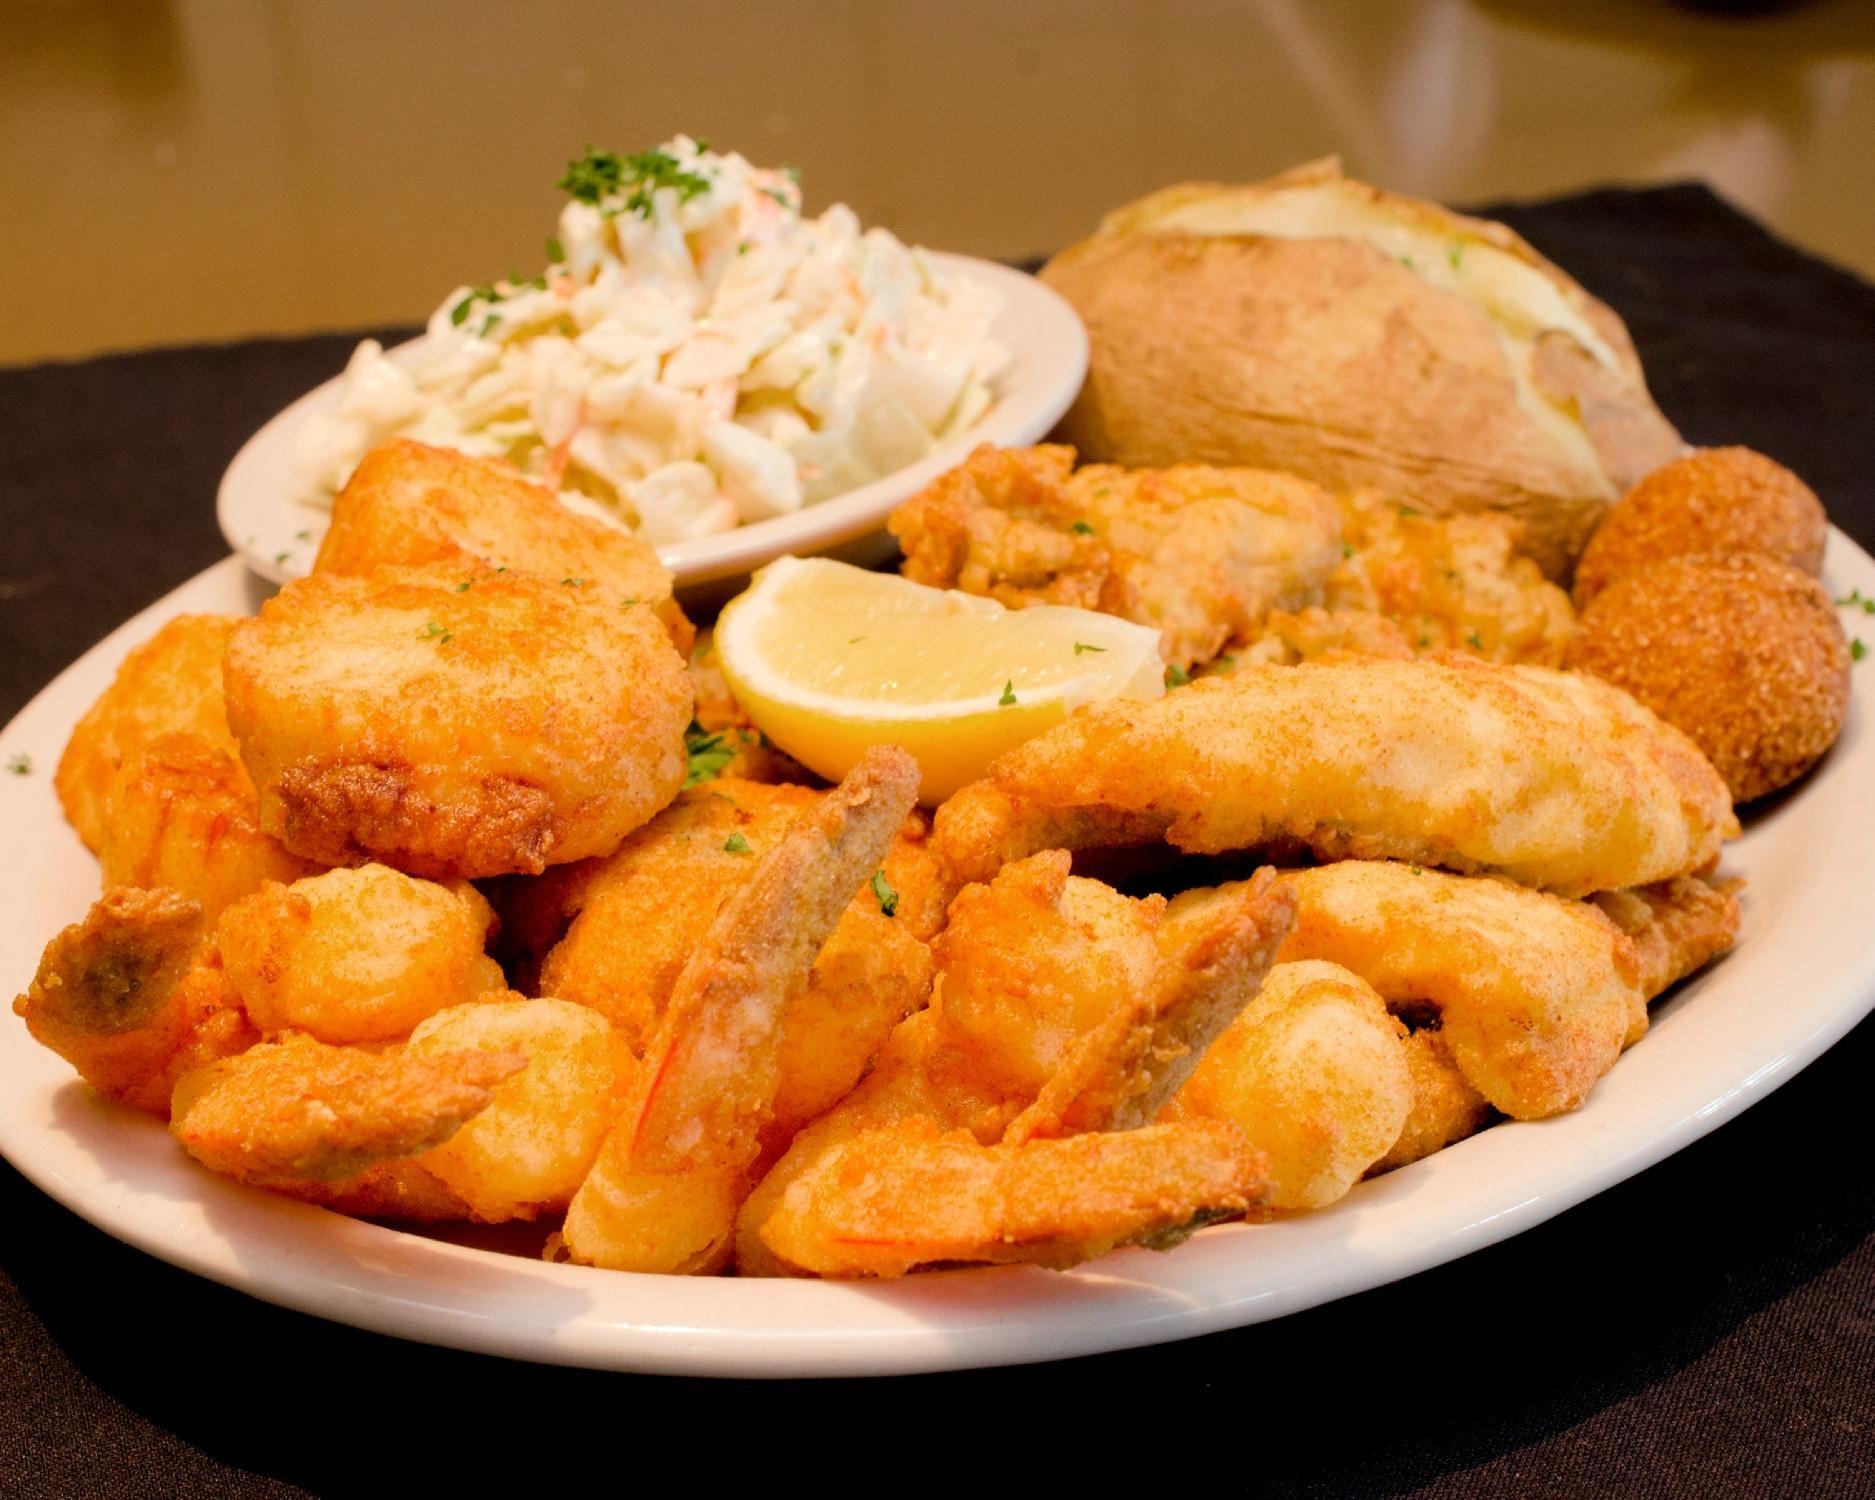 Reserve A Table At Hot Fish Club Murrells Inlet On Tripadvisor See 1 359 Unbiased